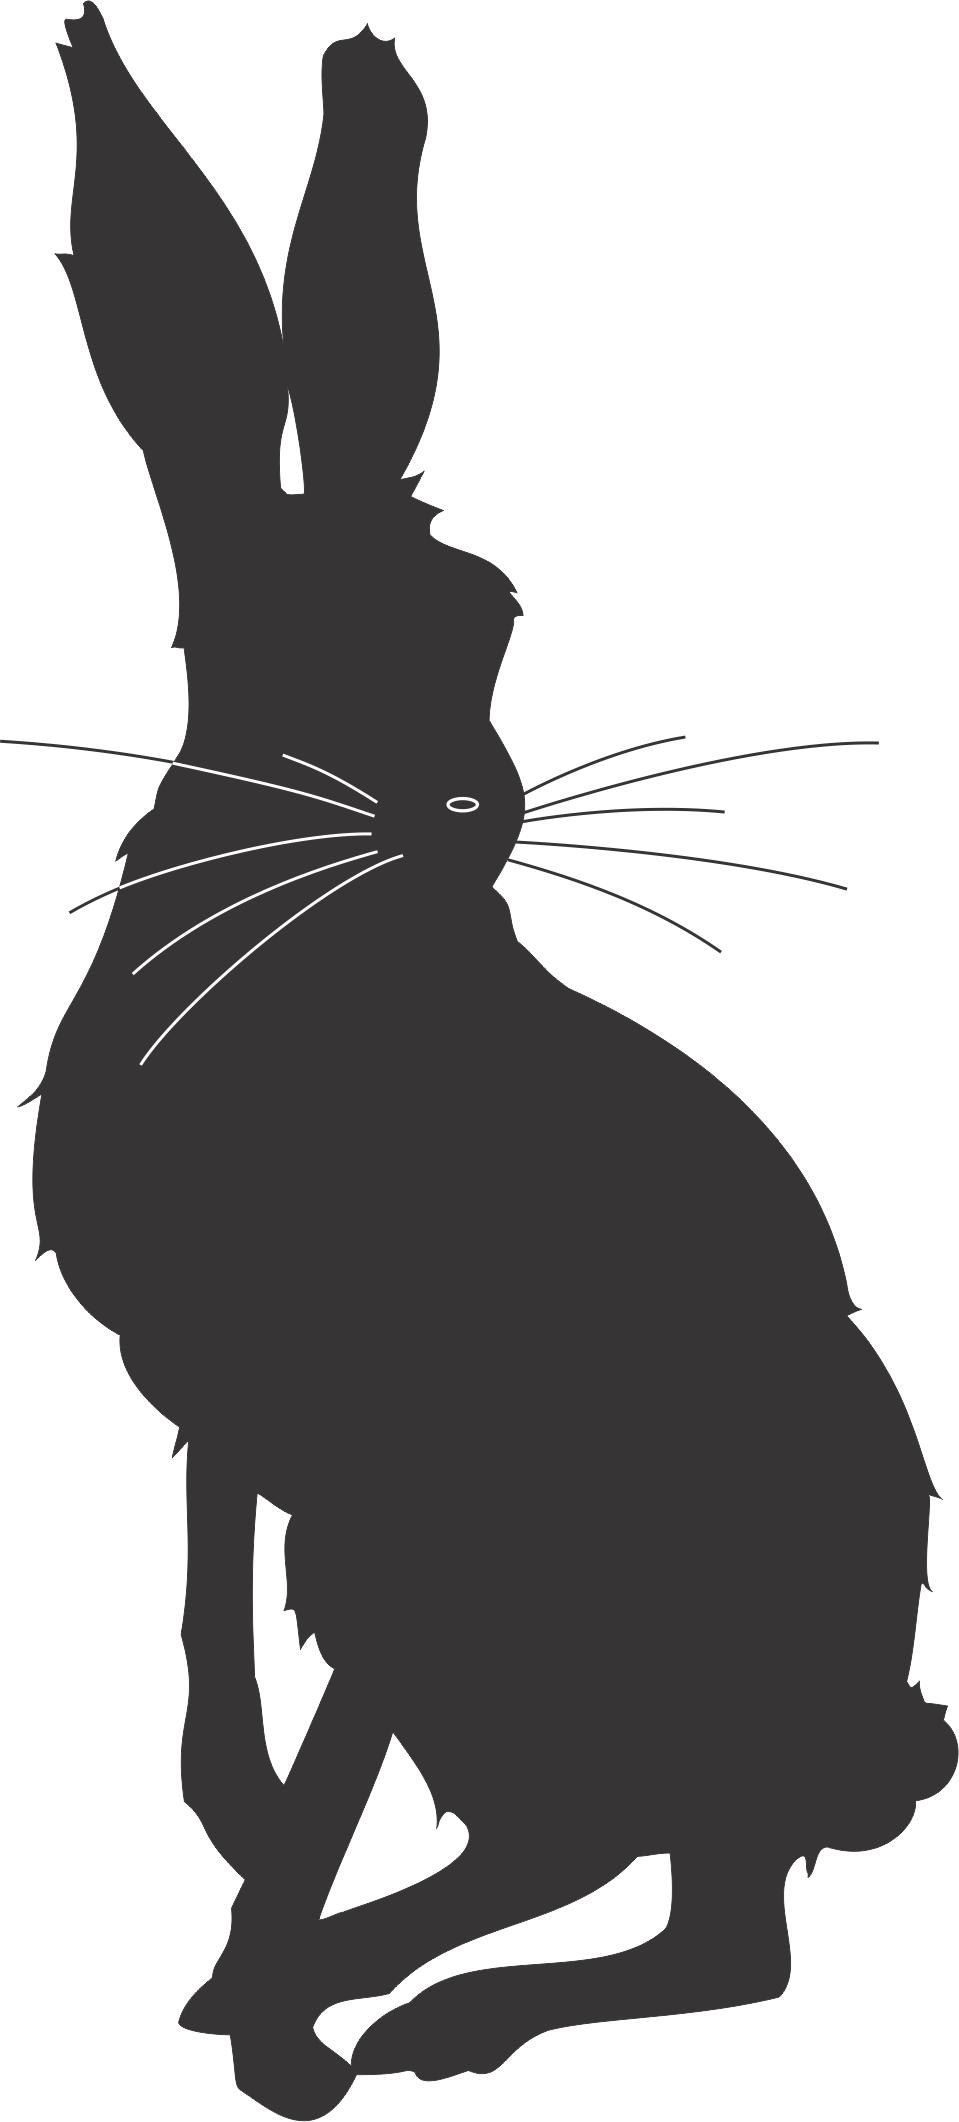 959x2122 Cartoon Rabbit Silhouette 02.jpg Pixels Letters, Etc